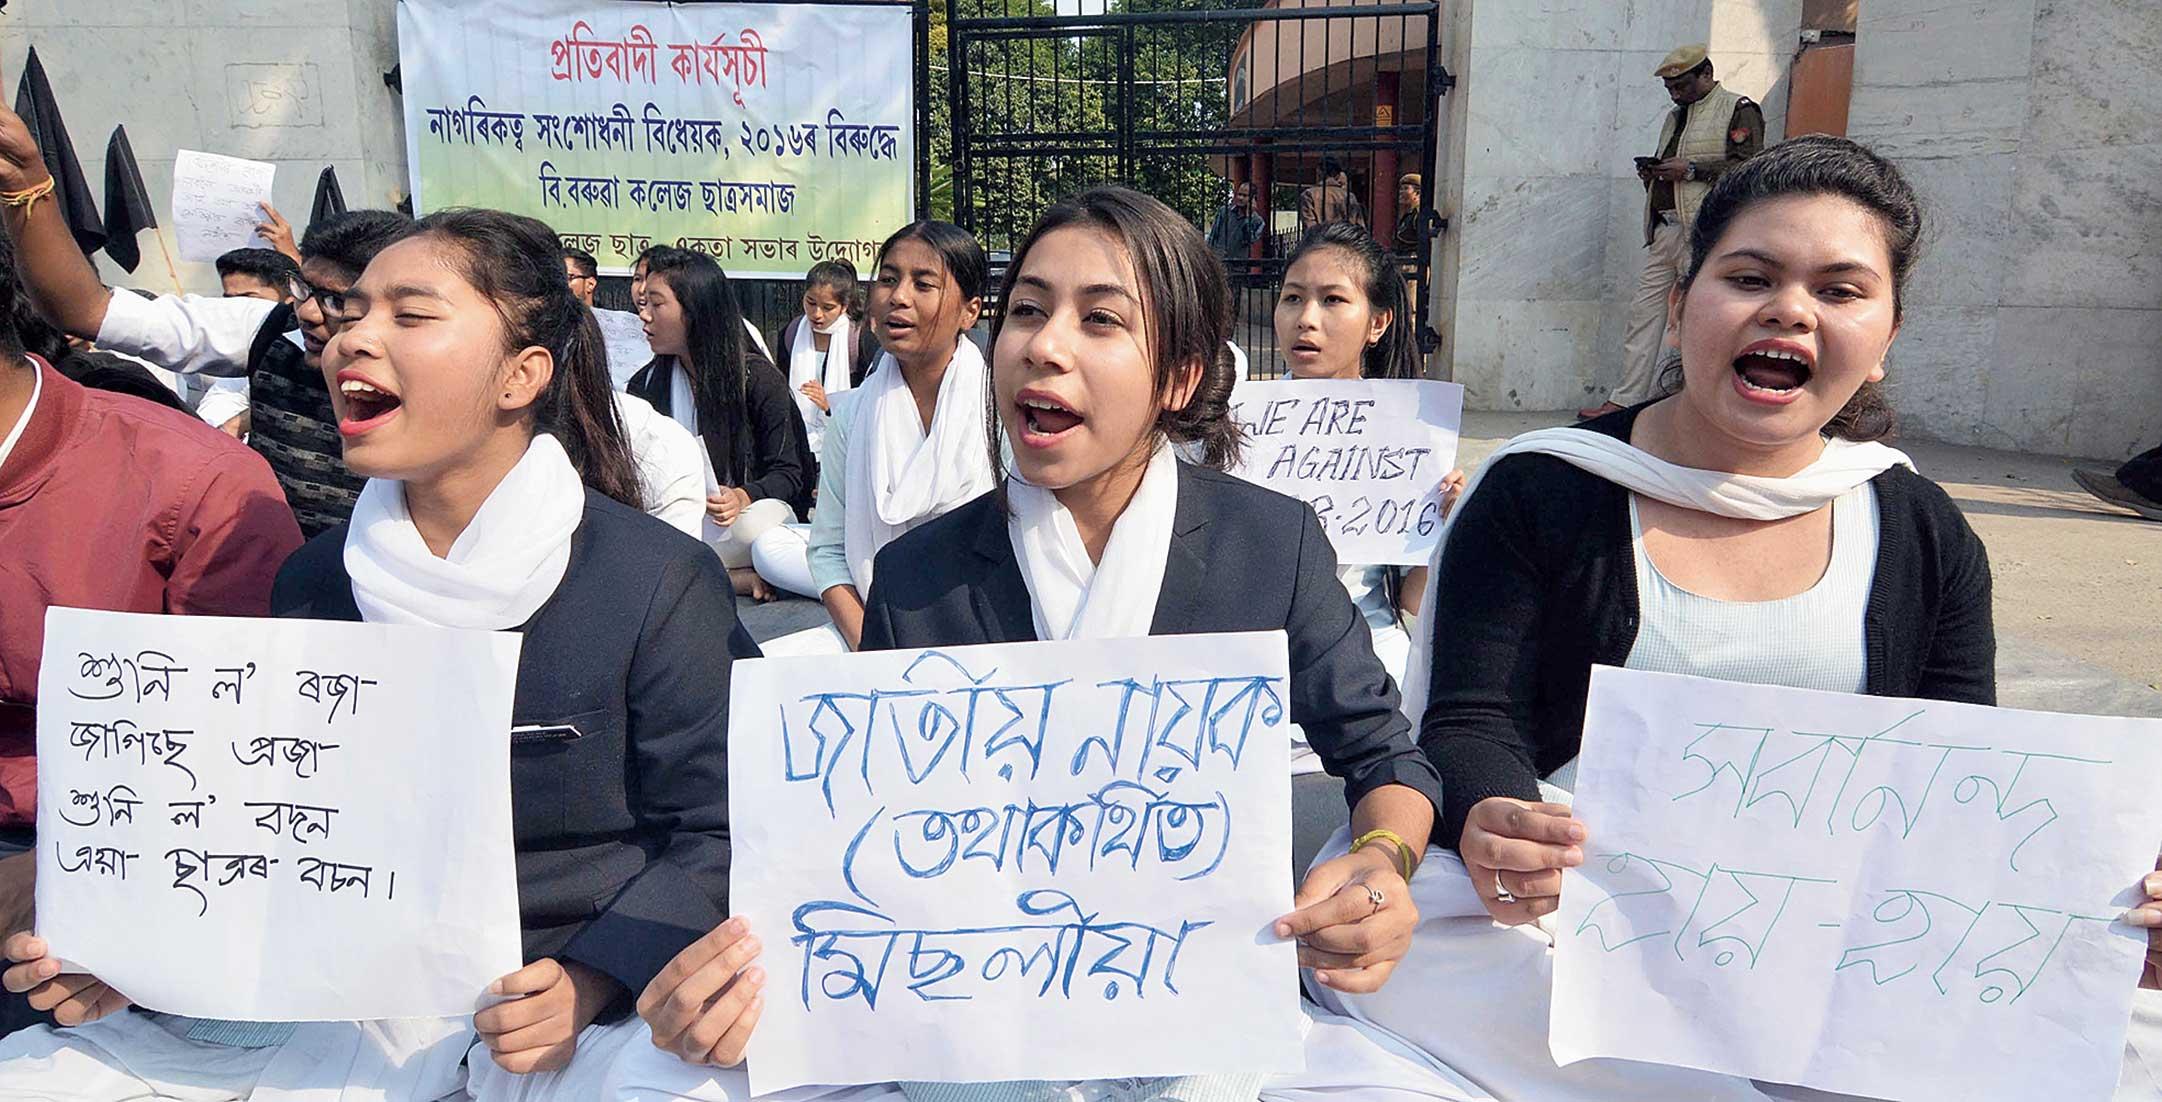 College students' slogans echo across Assam